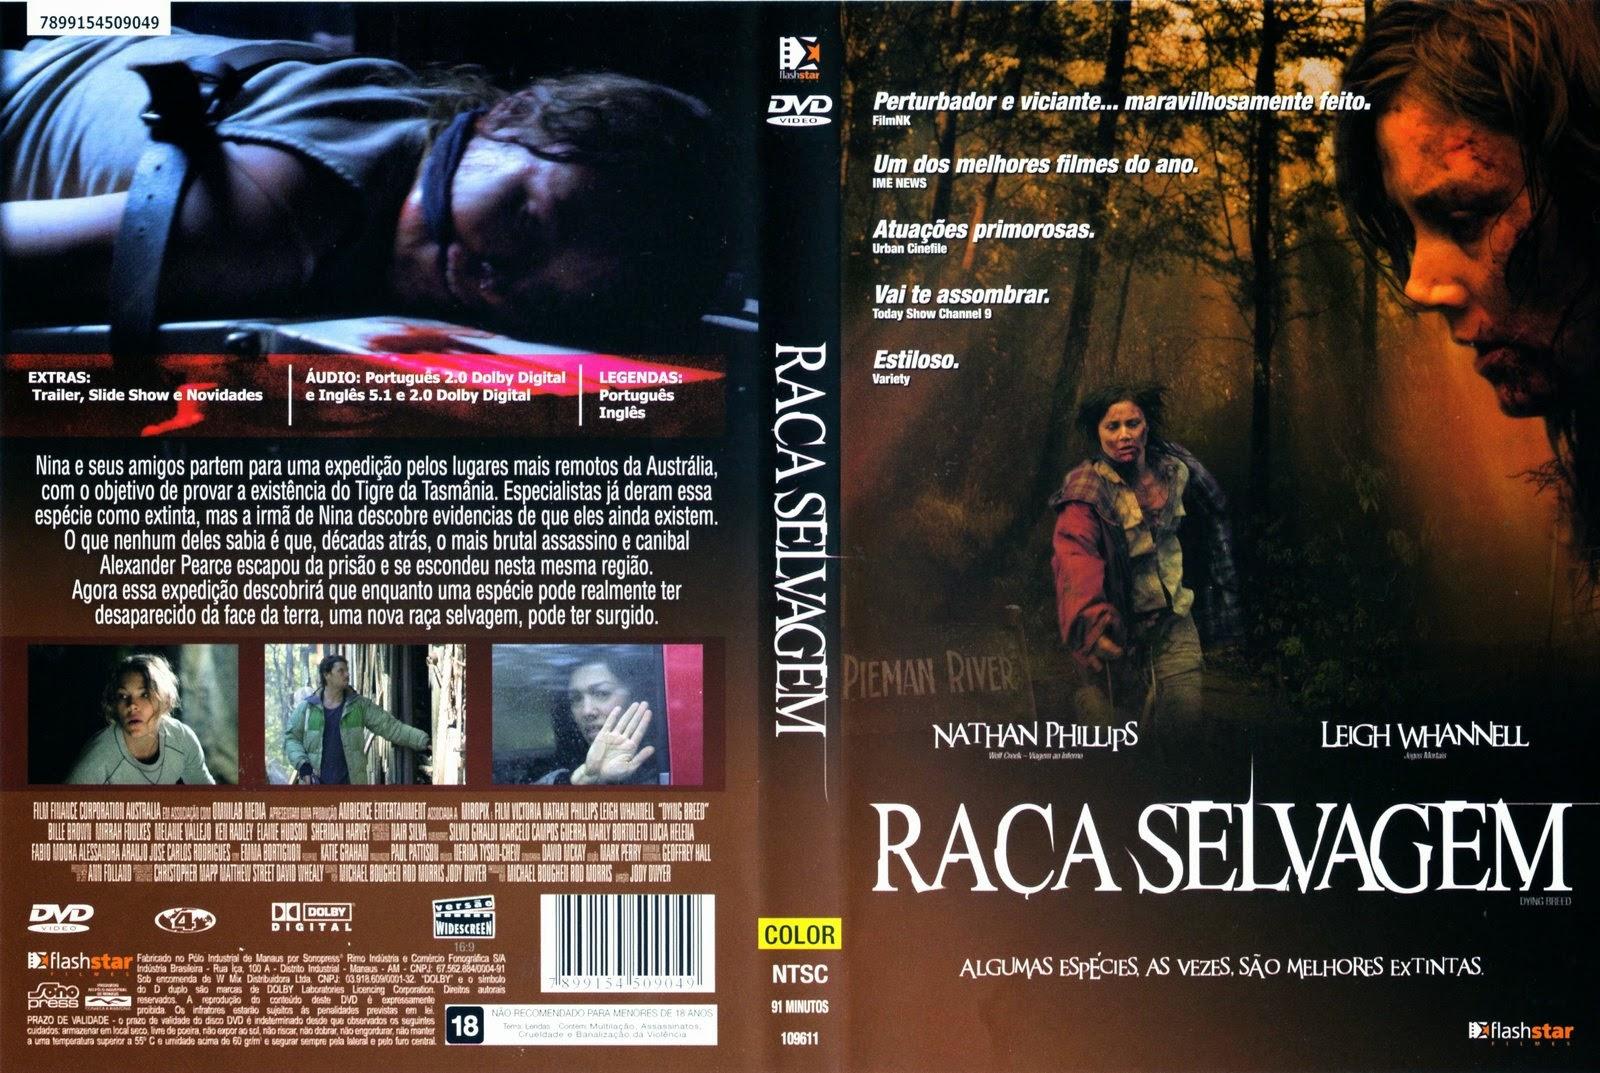 Raça Selvagem DVD Capa